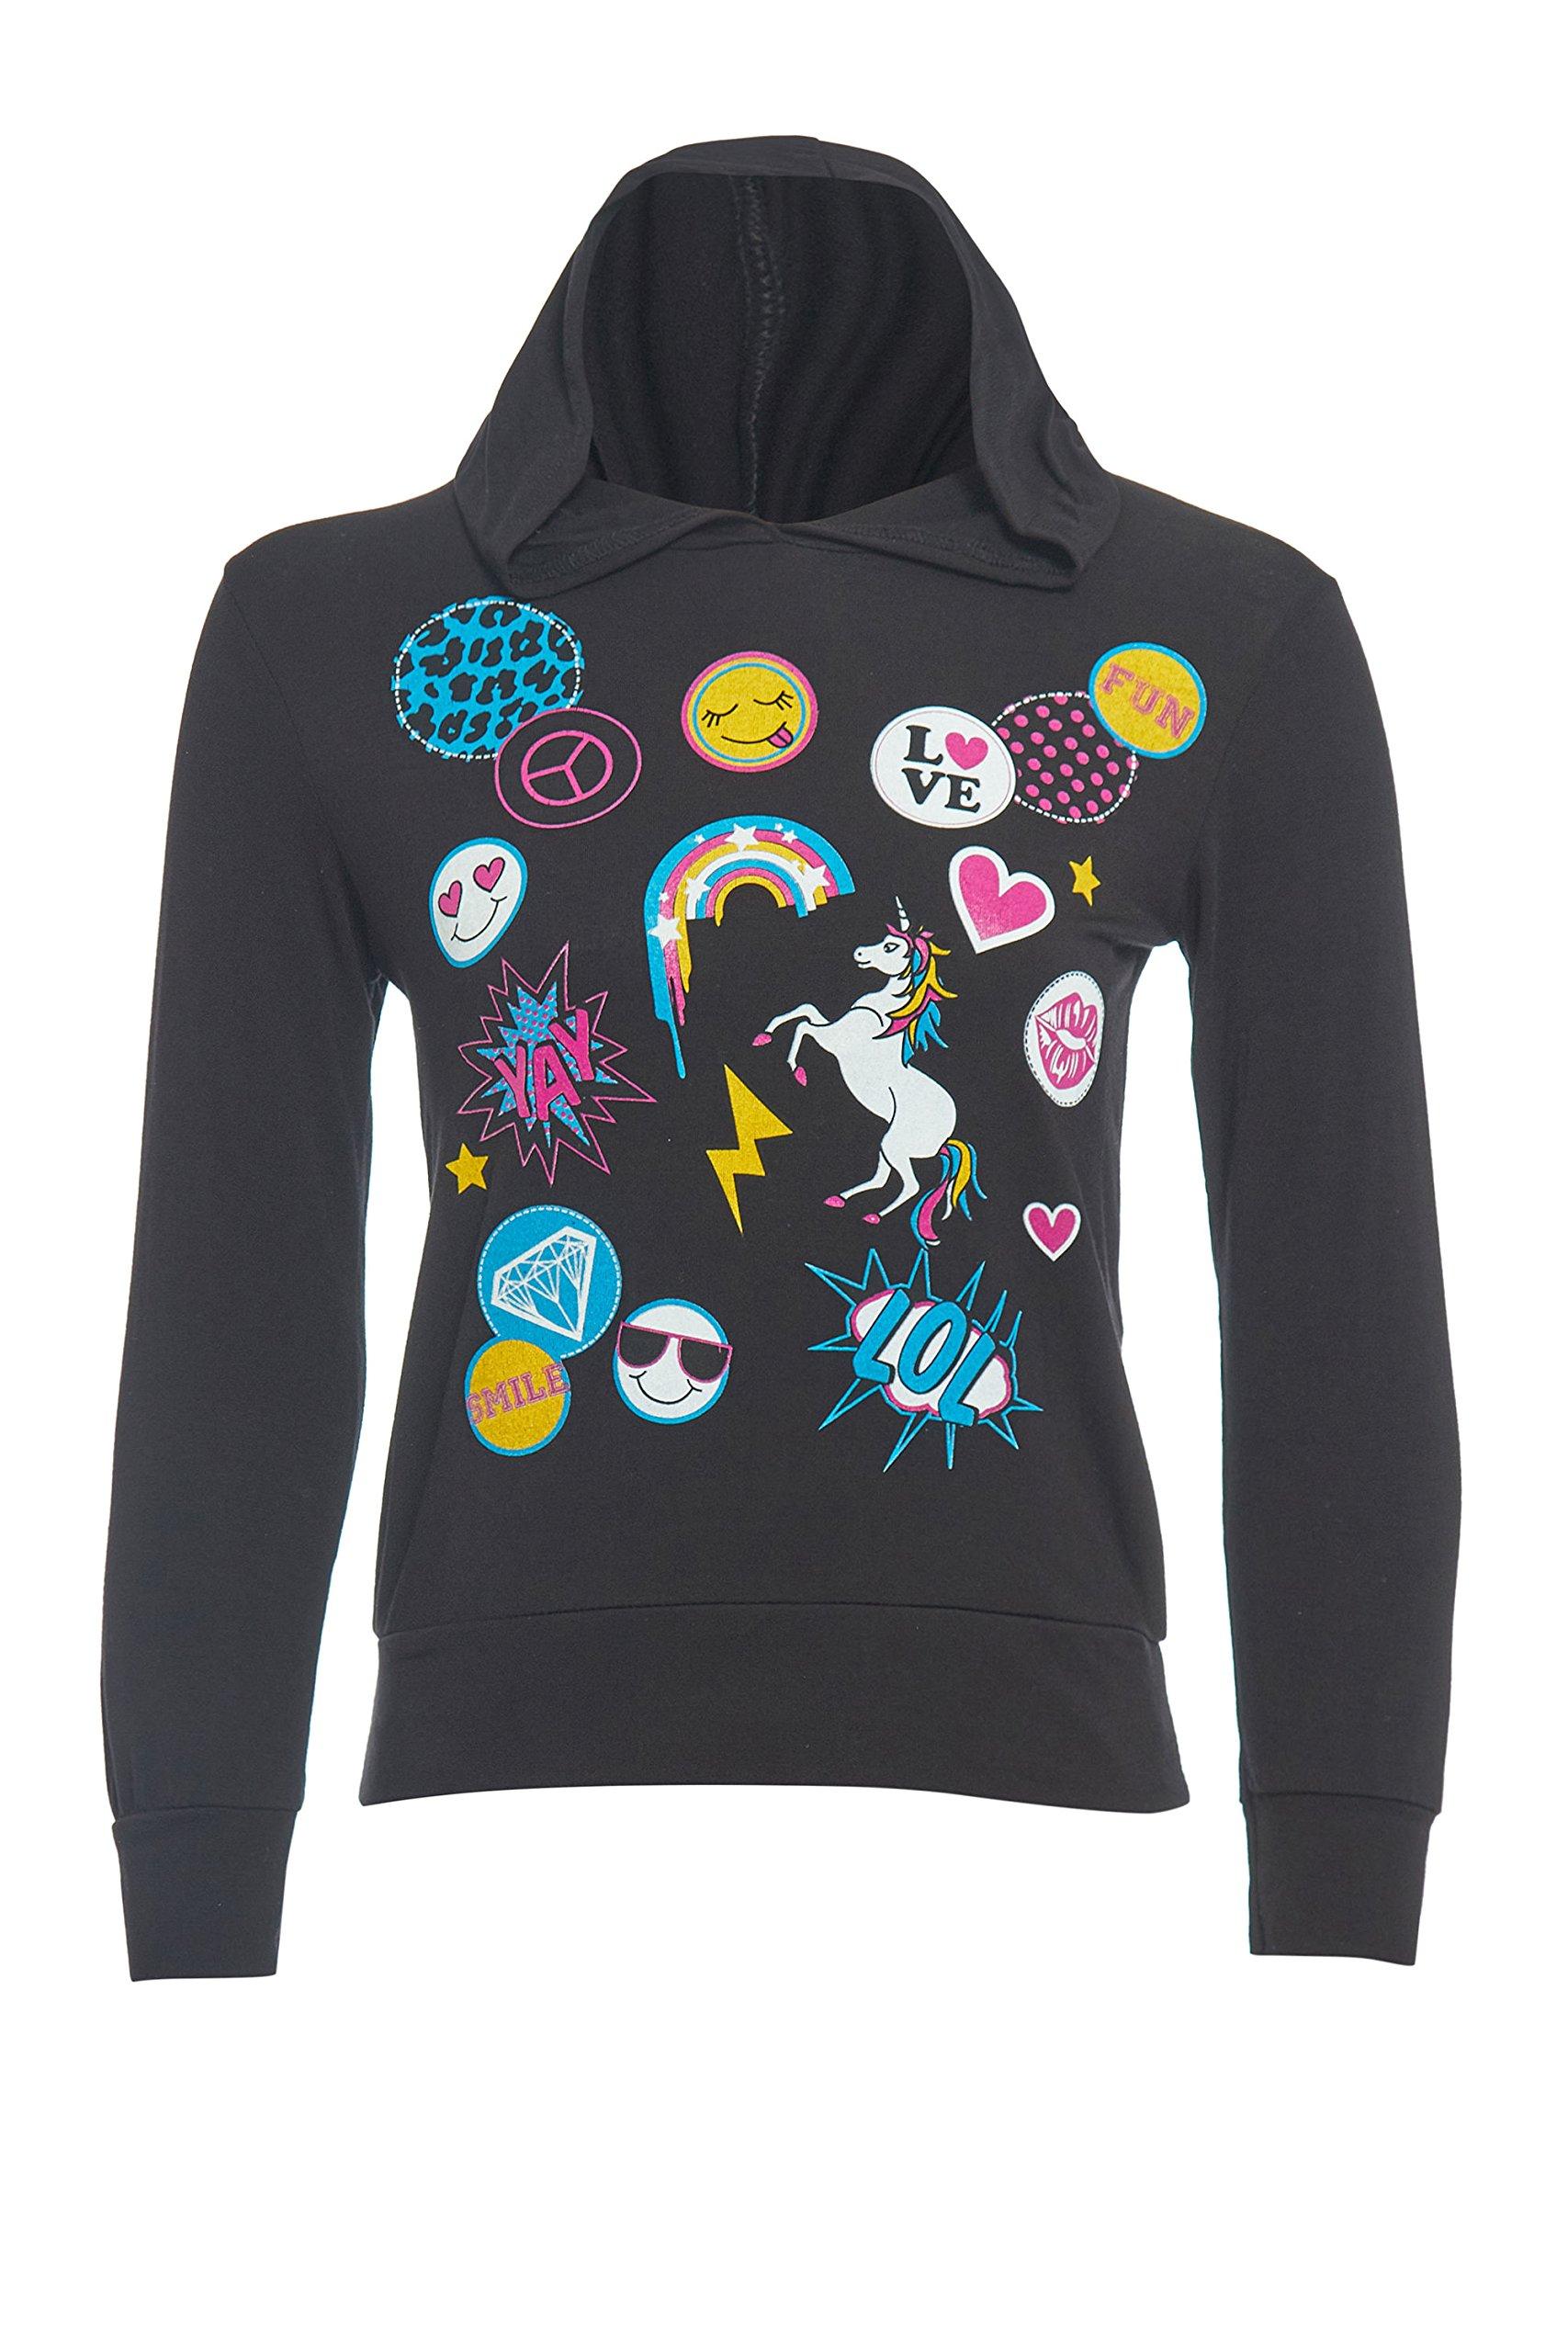 GUBA® Girls Unicorn Emoji Print Fairytale Long Sleeve Hoodie Size 7-13 Years (Black, 11-12 Years)